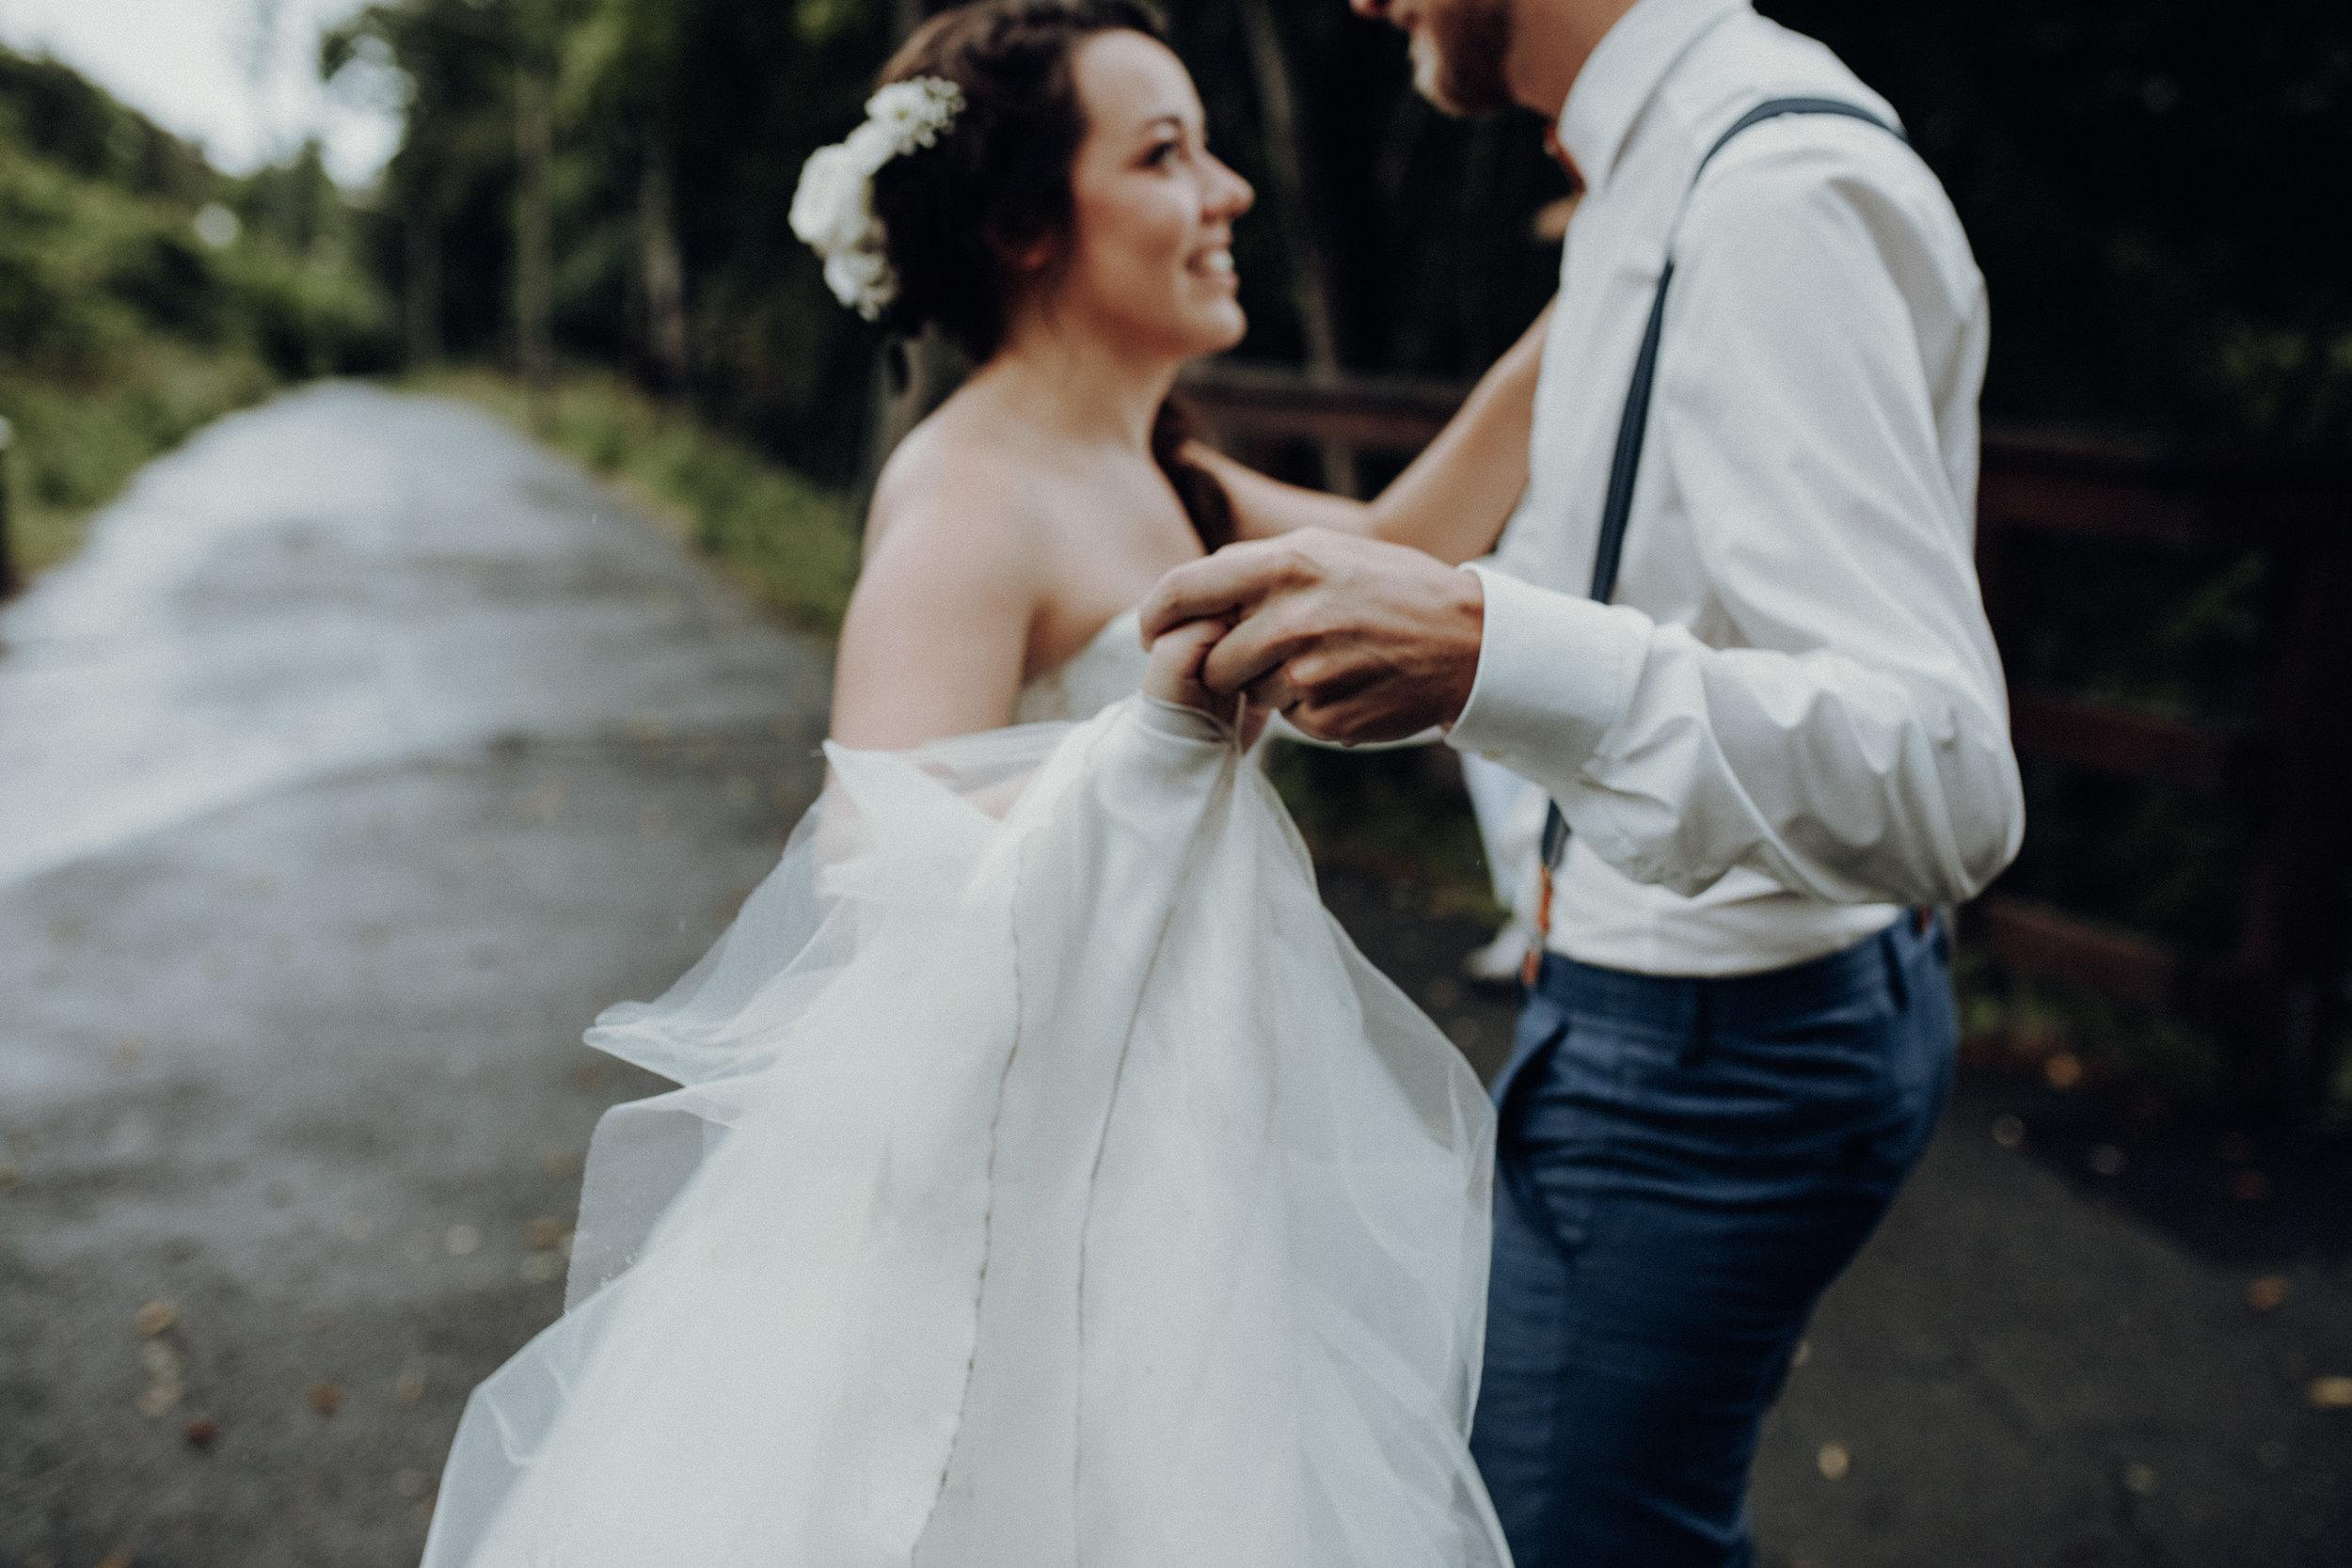 nathanael & karin - nuremberg / august 2019 / wedding